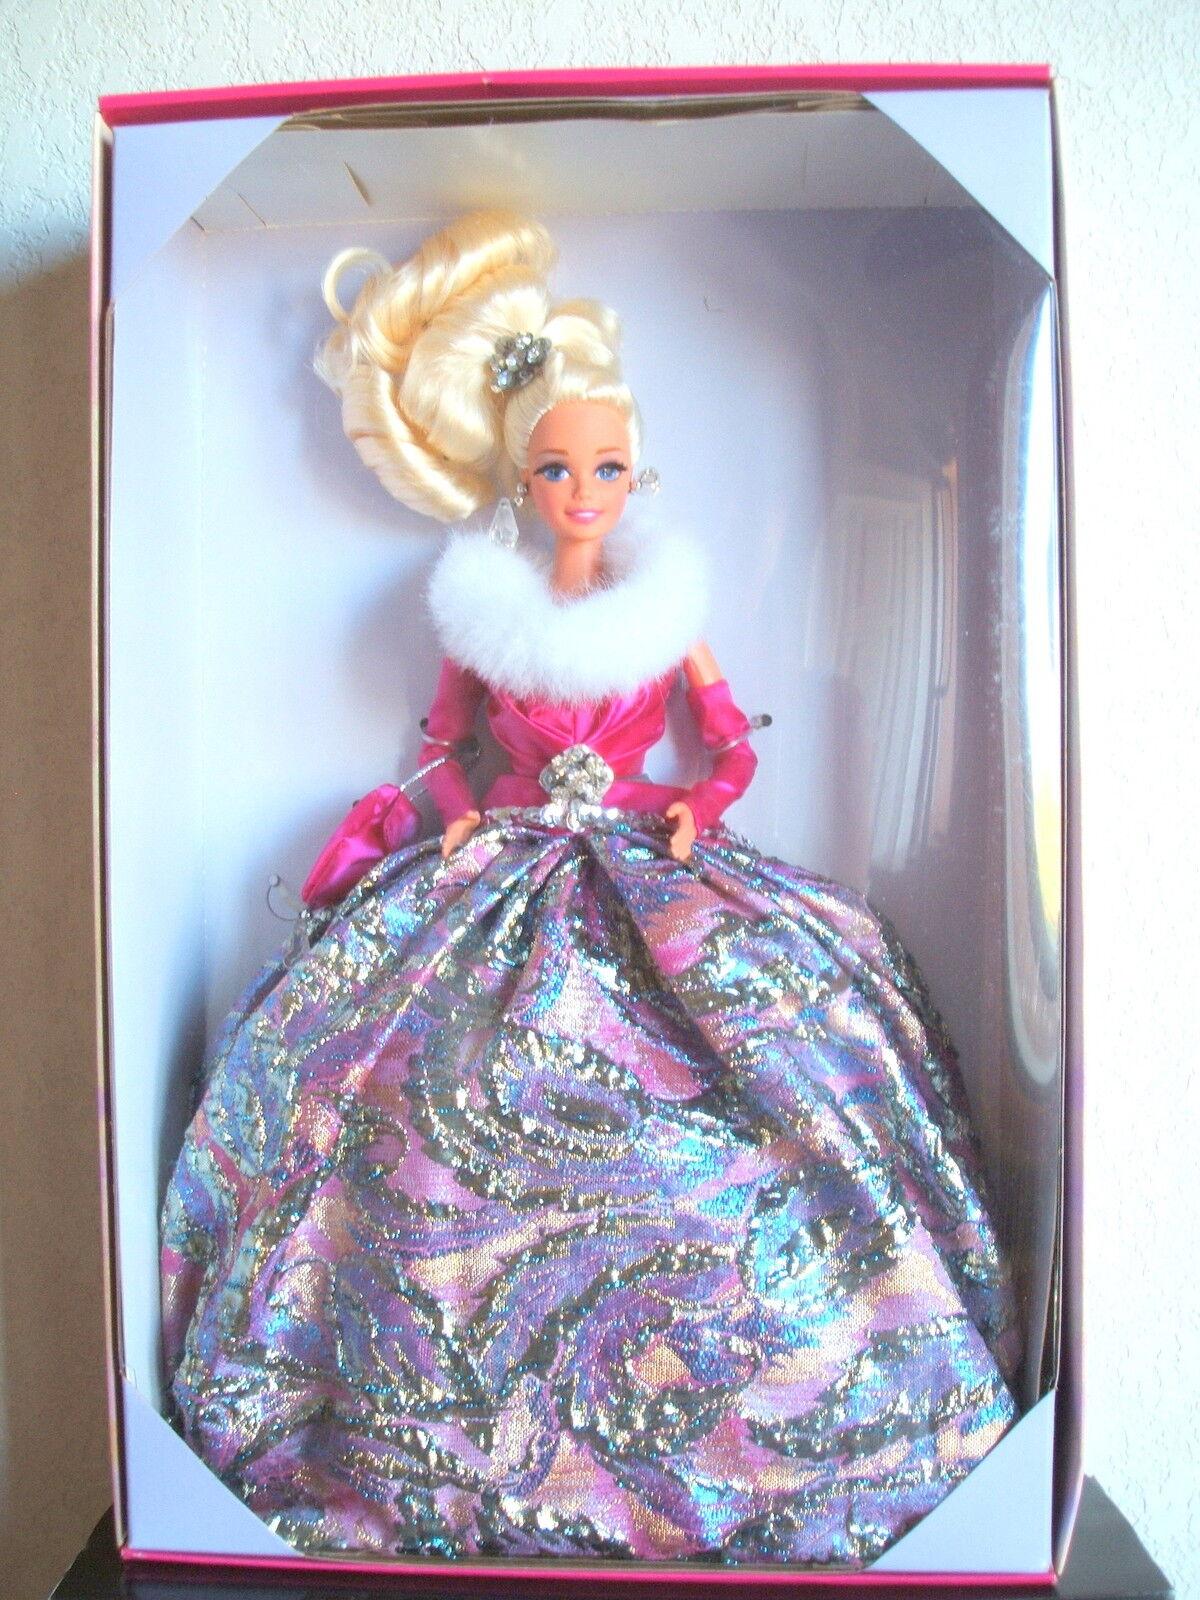 Poupée Barbie collection 1995 BtuttiROOM  BEAUTIES estrellaLIGHT WALTZ 14070 LIMITED  il più alla moda